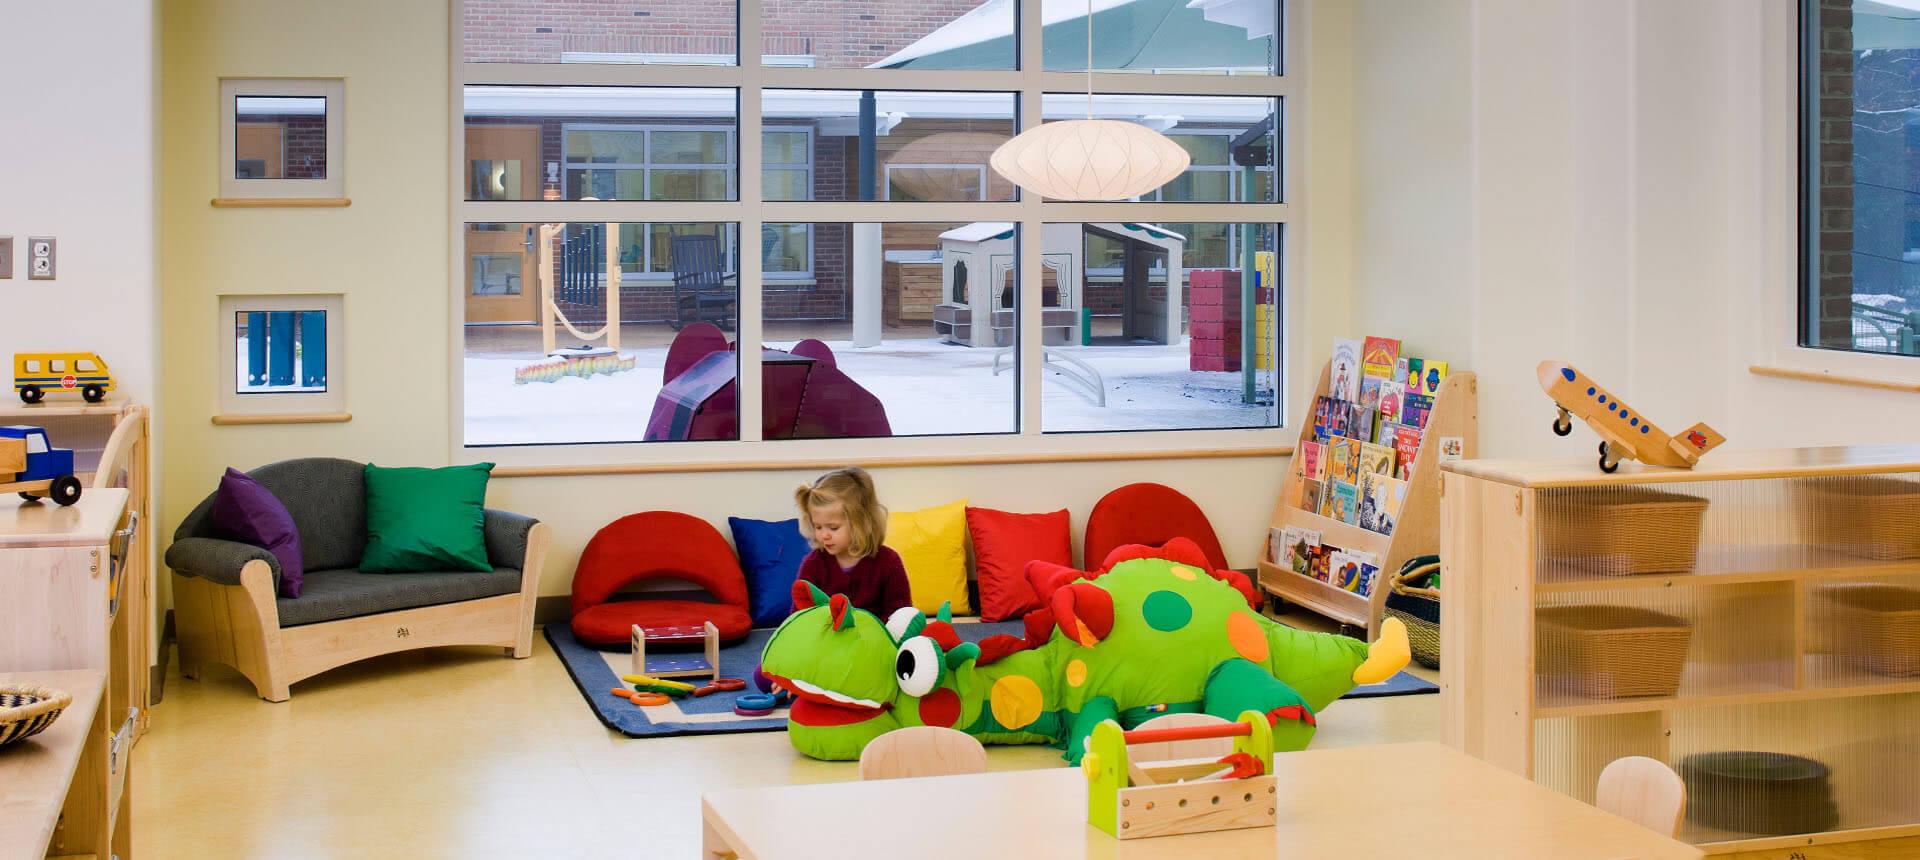 Fda Child Care Center Callisonrtkl